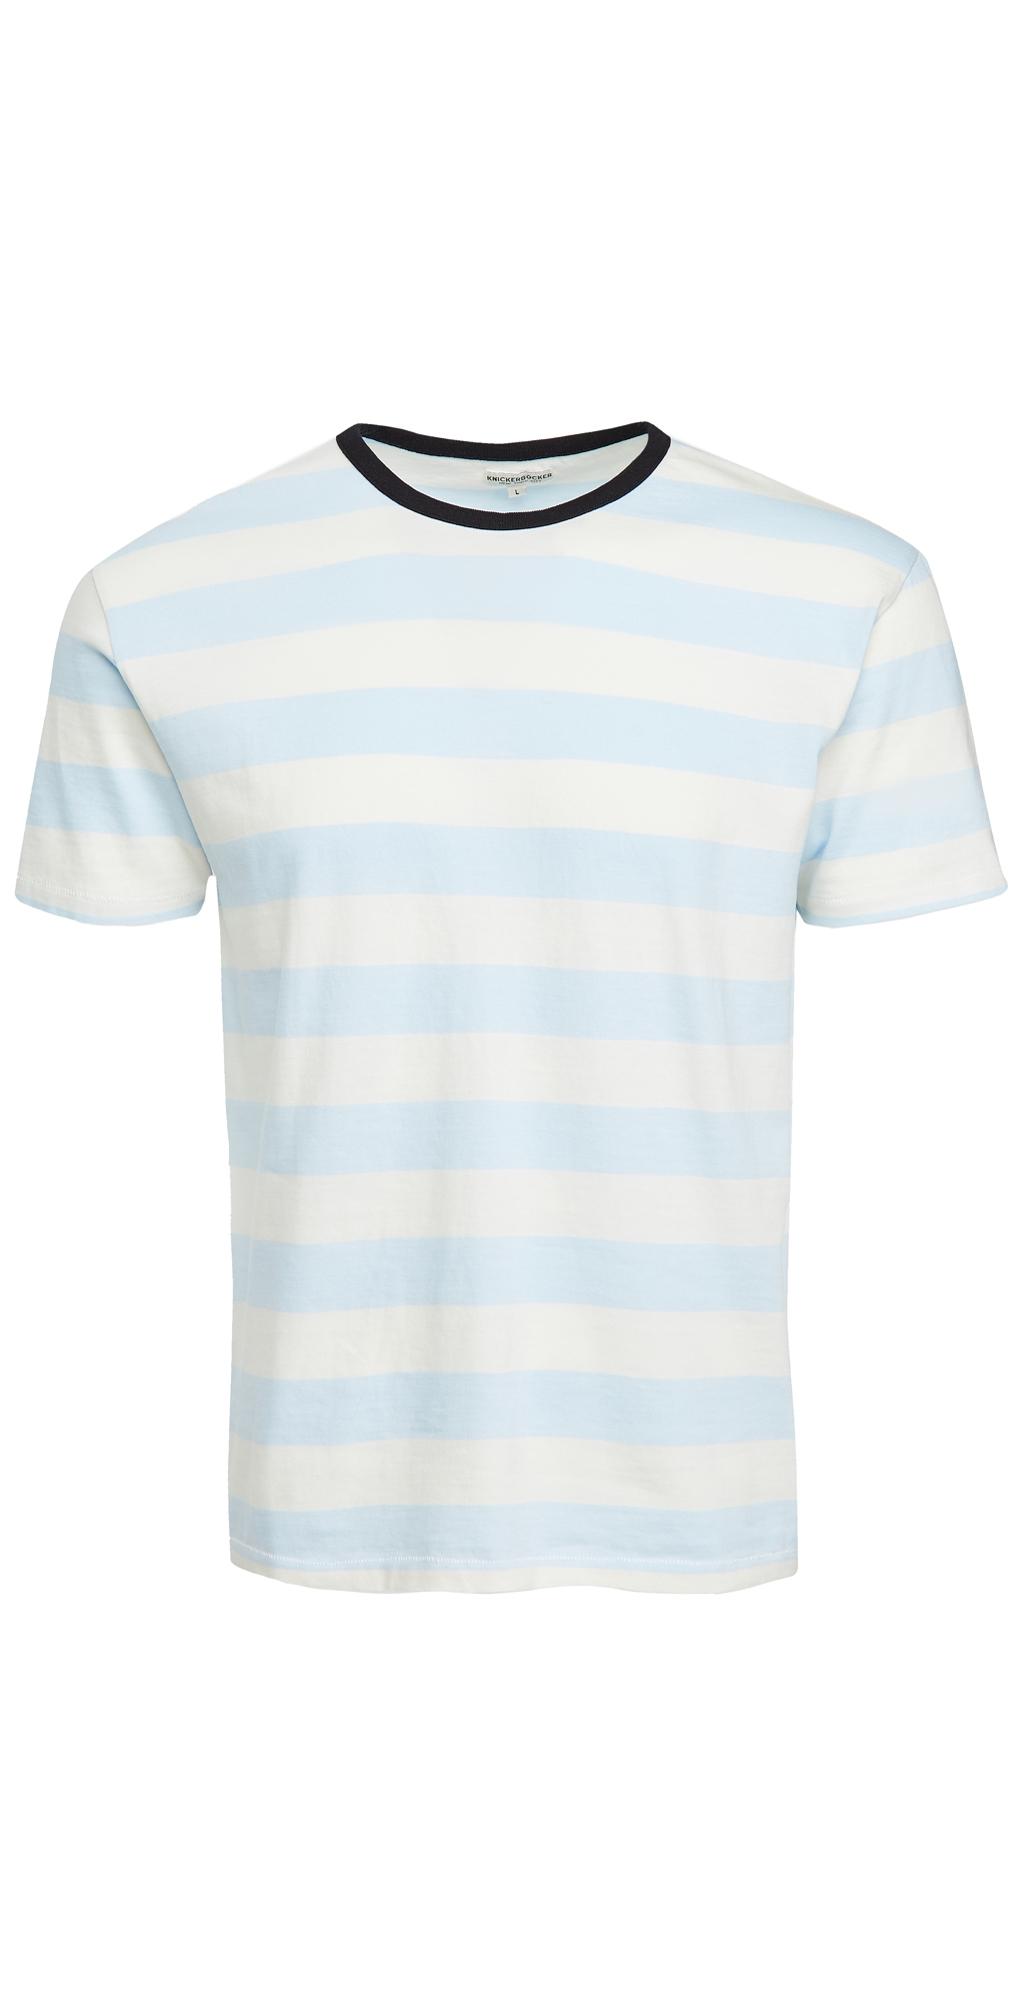 The Mojave T-Shirt